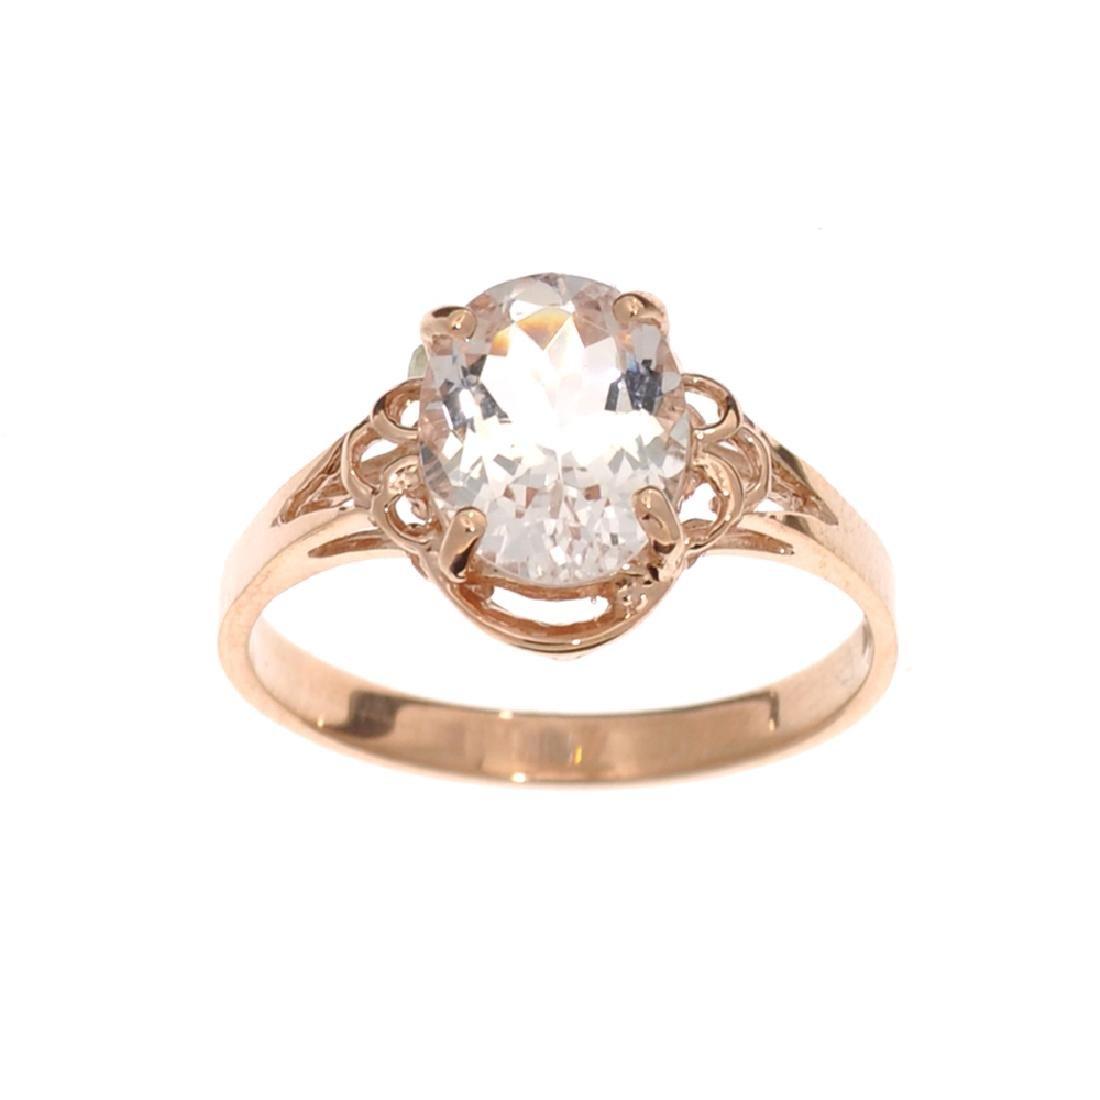 APP: 1.4k Fine Jewelry 14KT Gold, 1.65CT Oval Cut